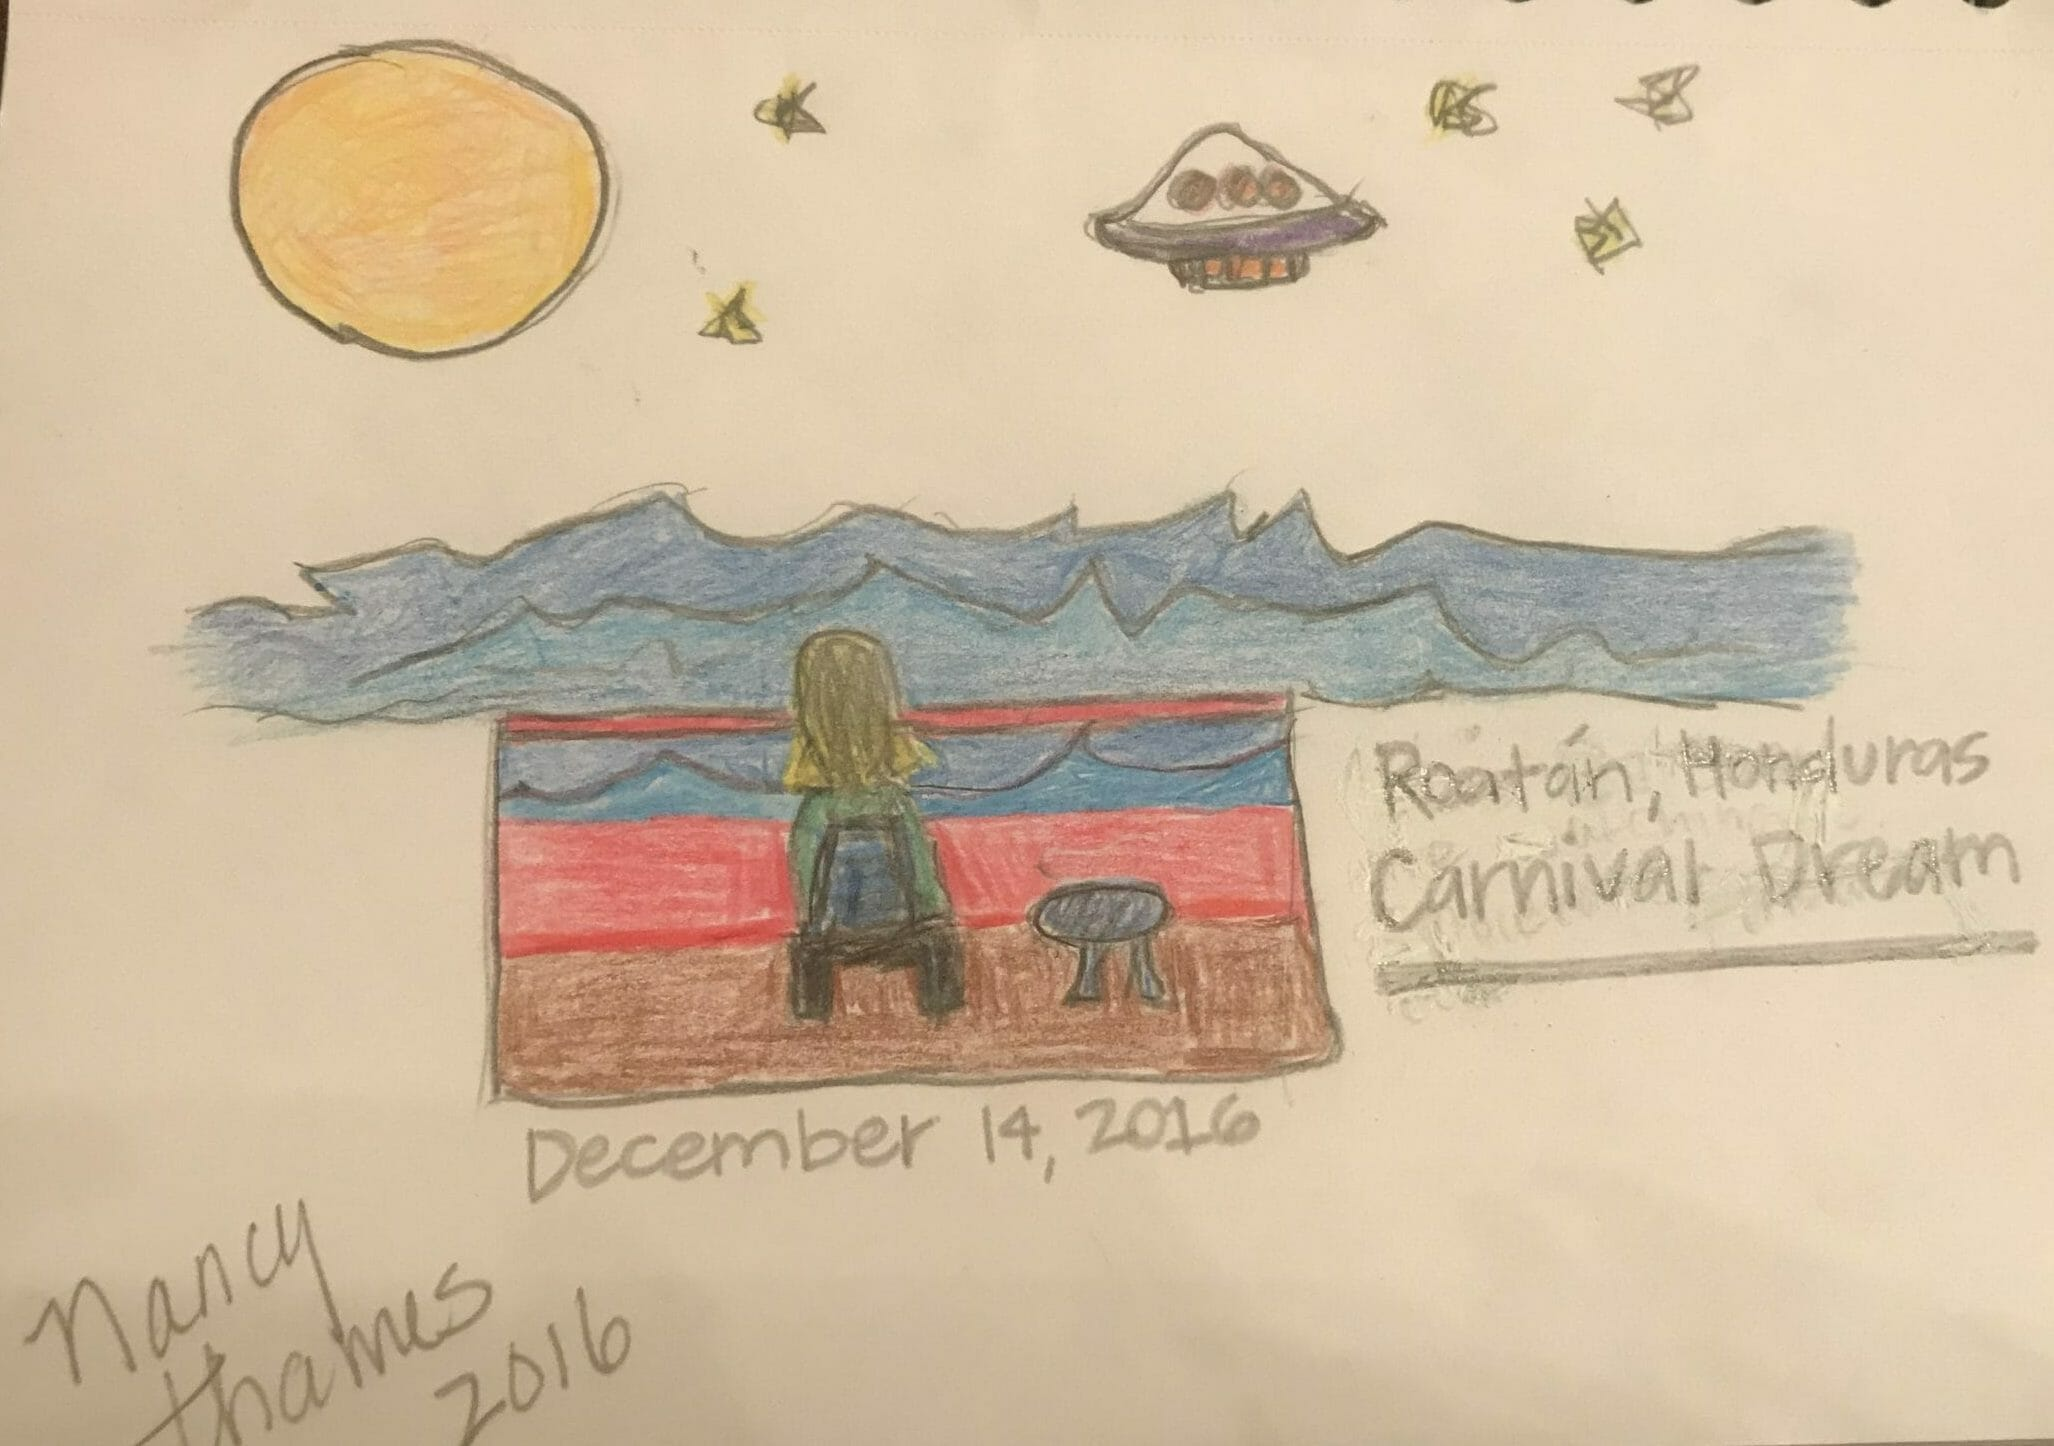 Nancy Thmes Alien encounter on carnival cruise while near Honduras